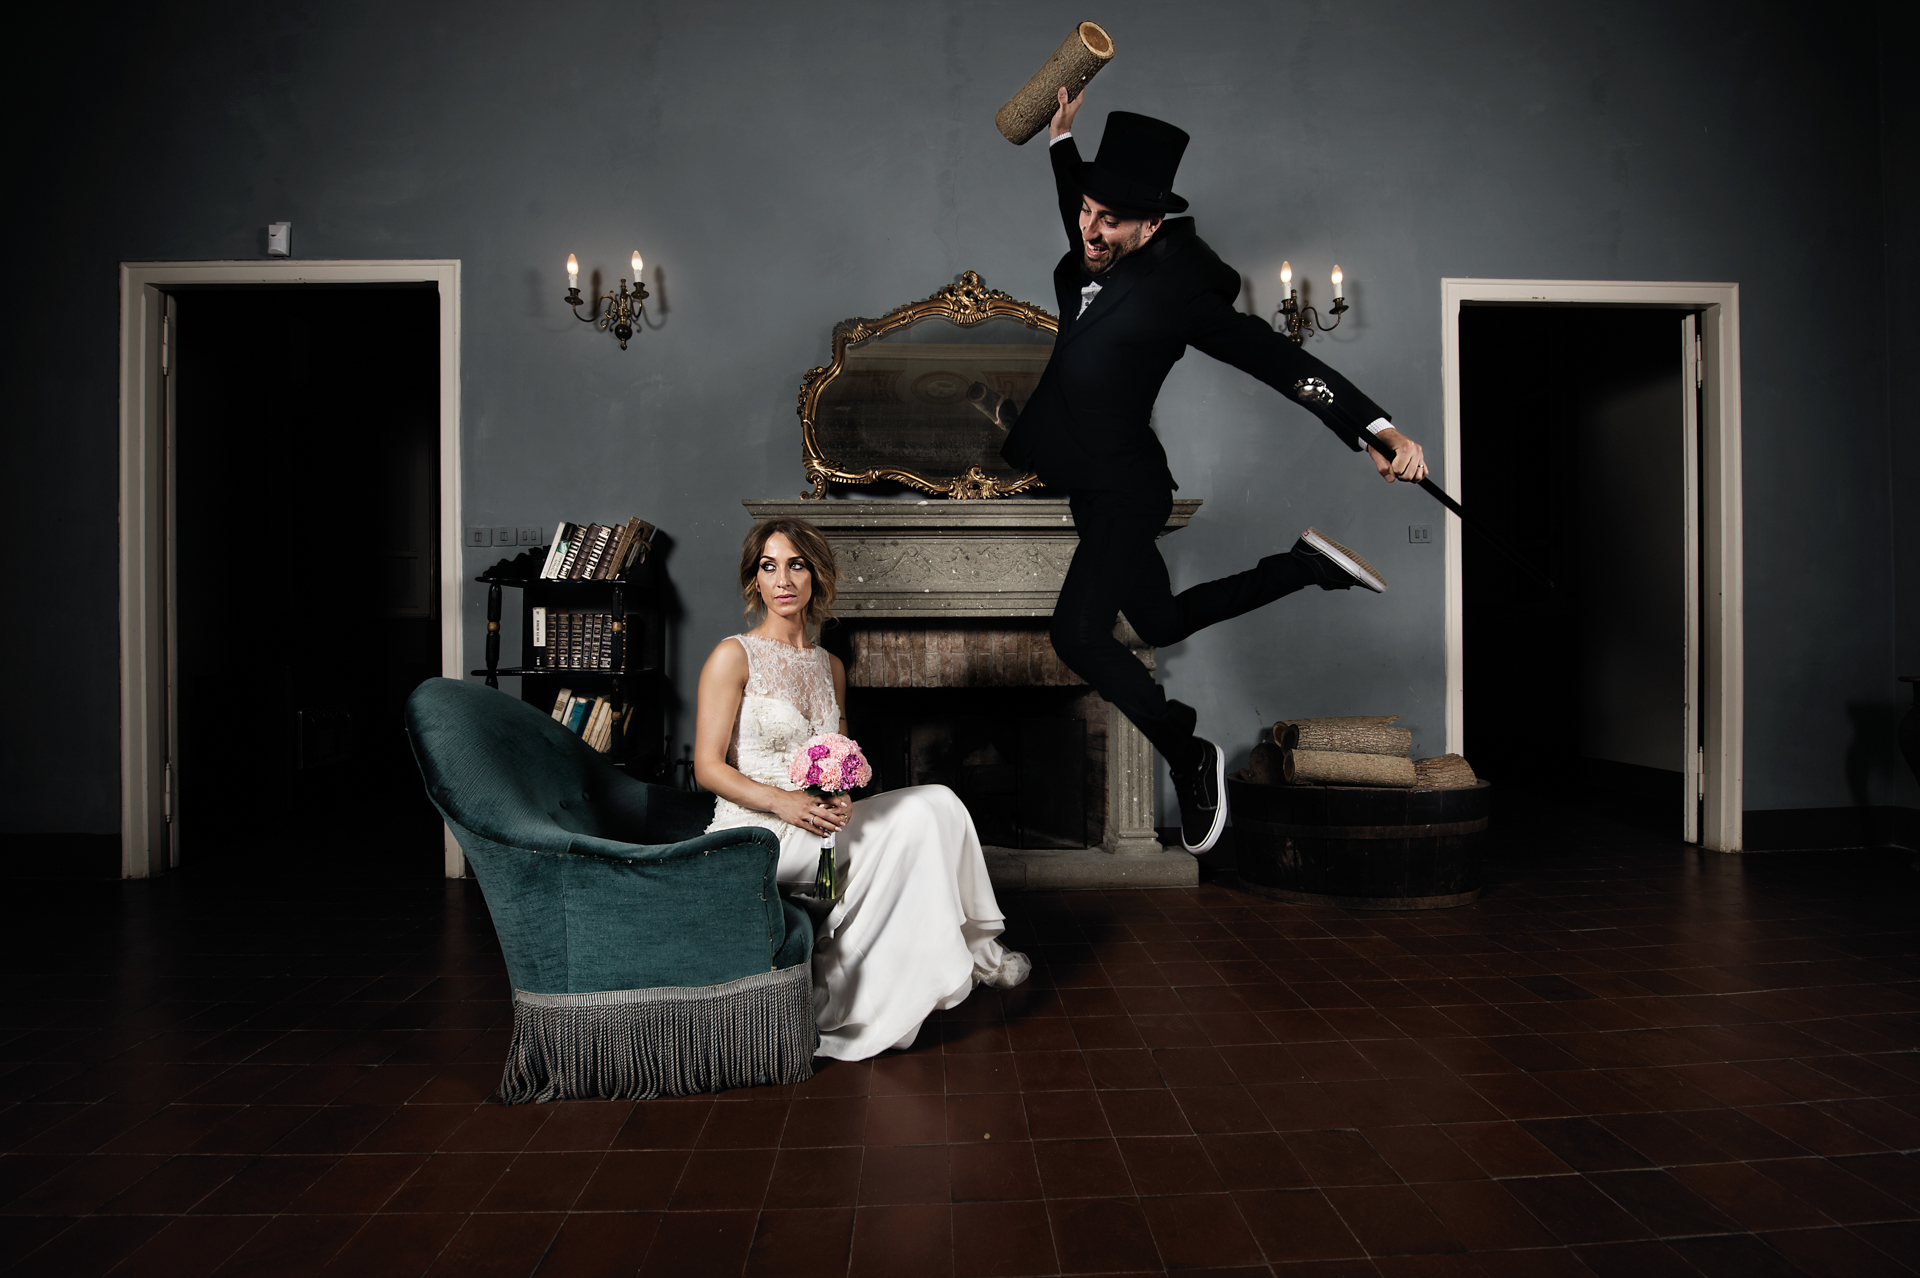 matrimonio-foto-latina-sposi-01